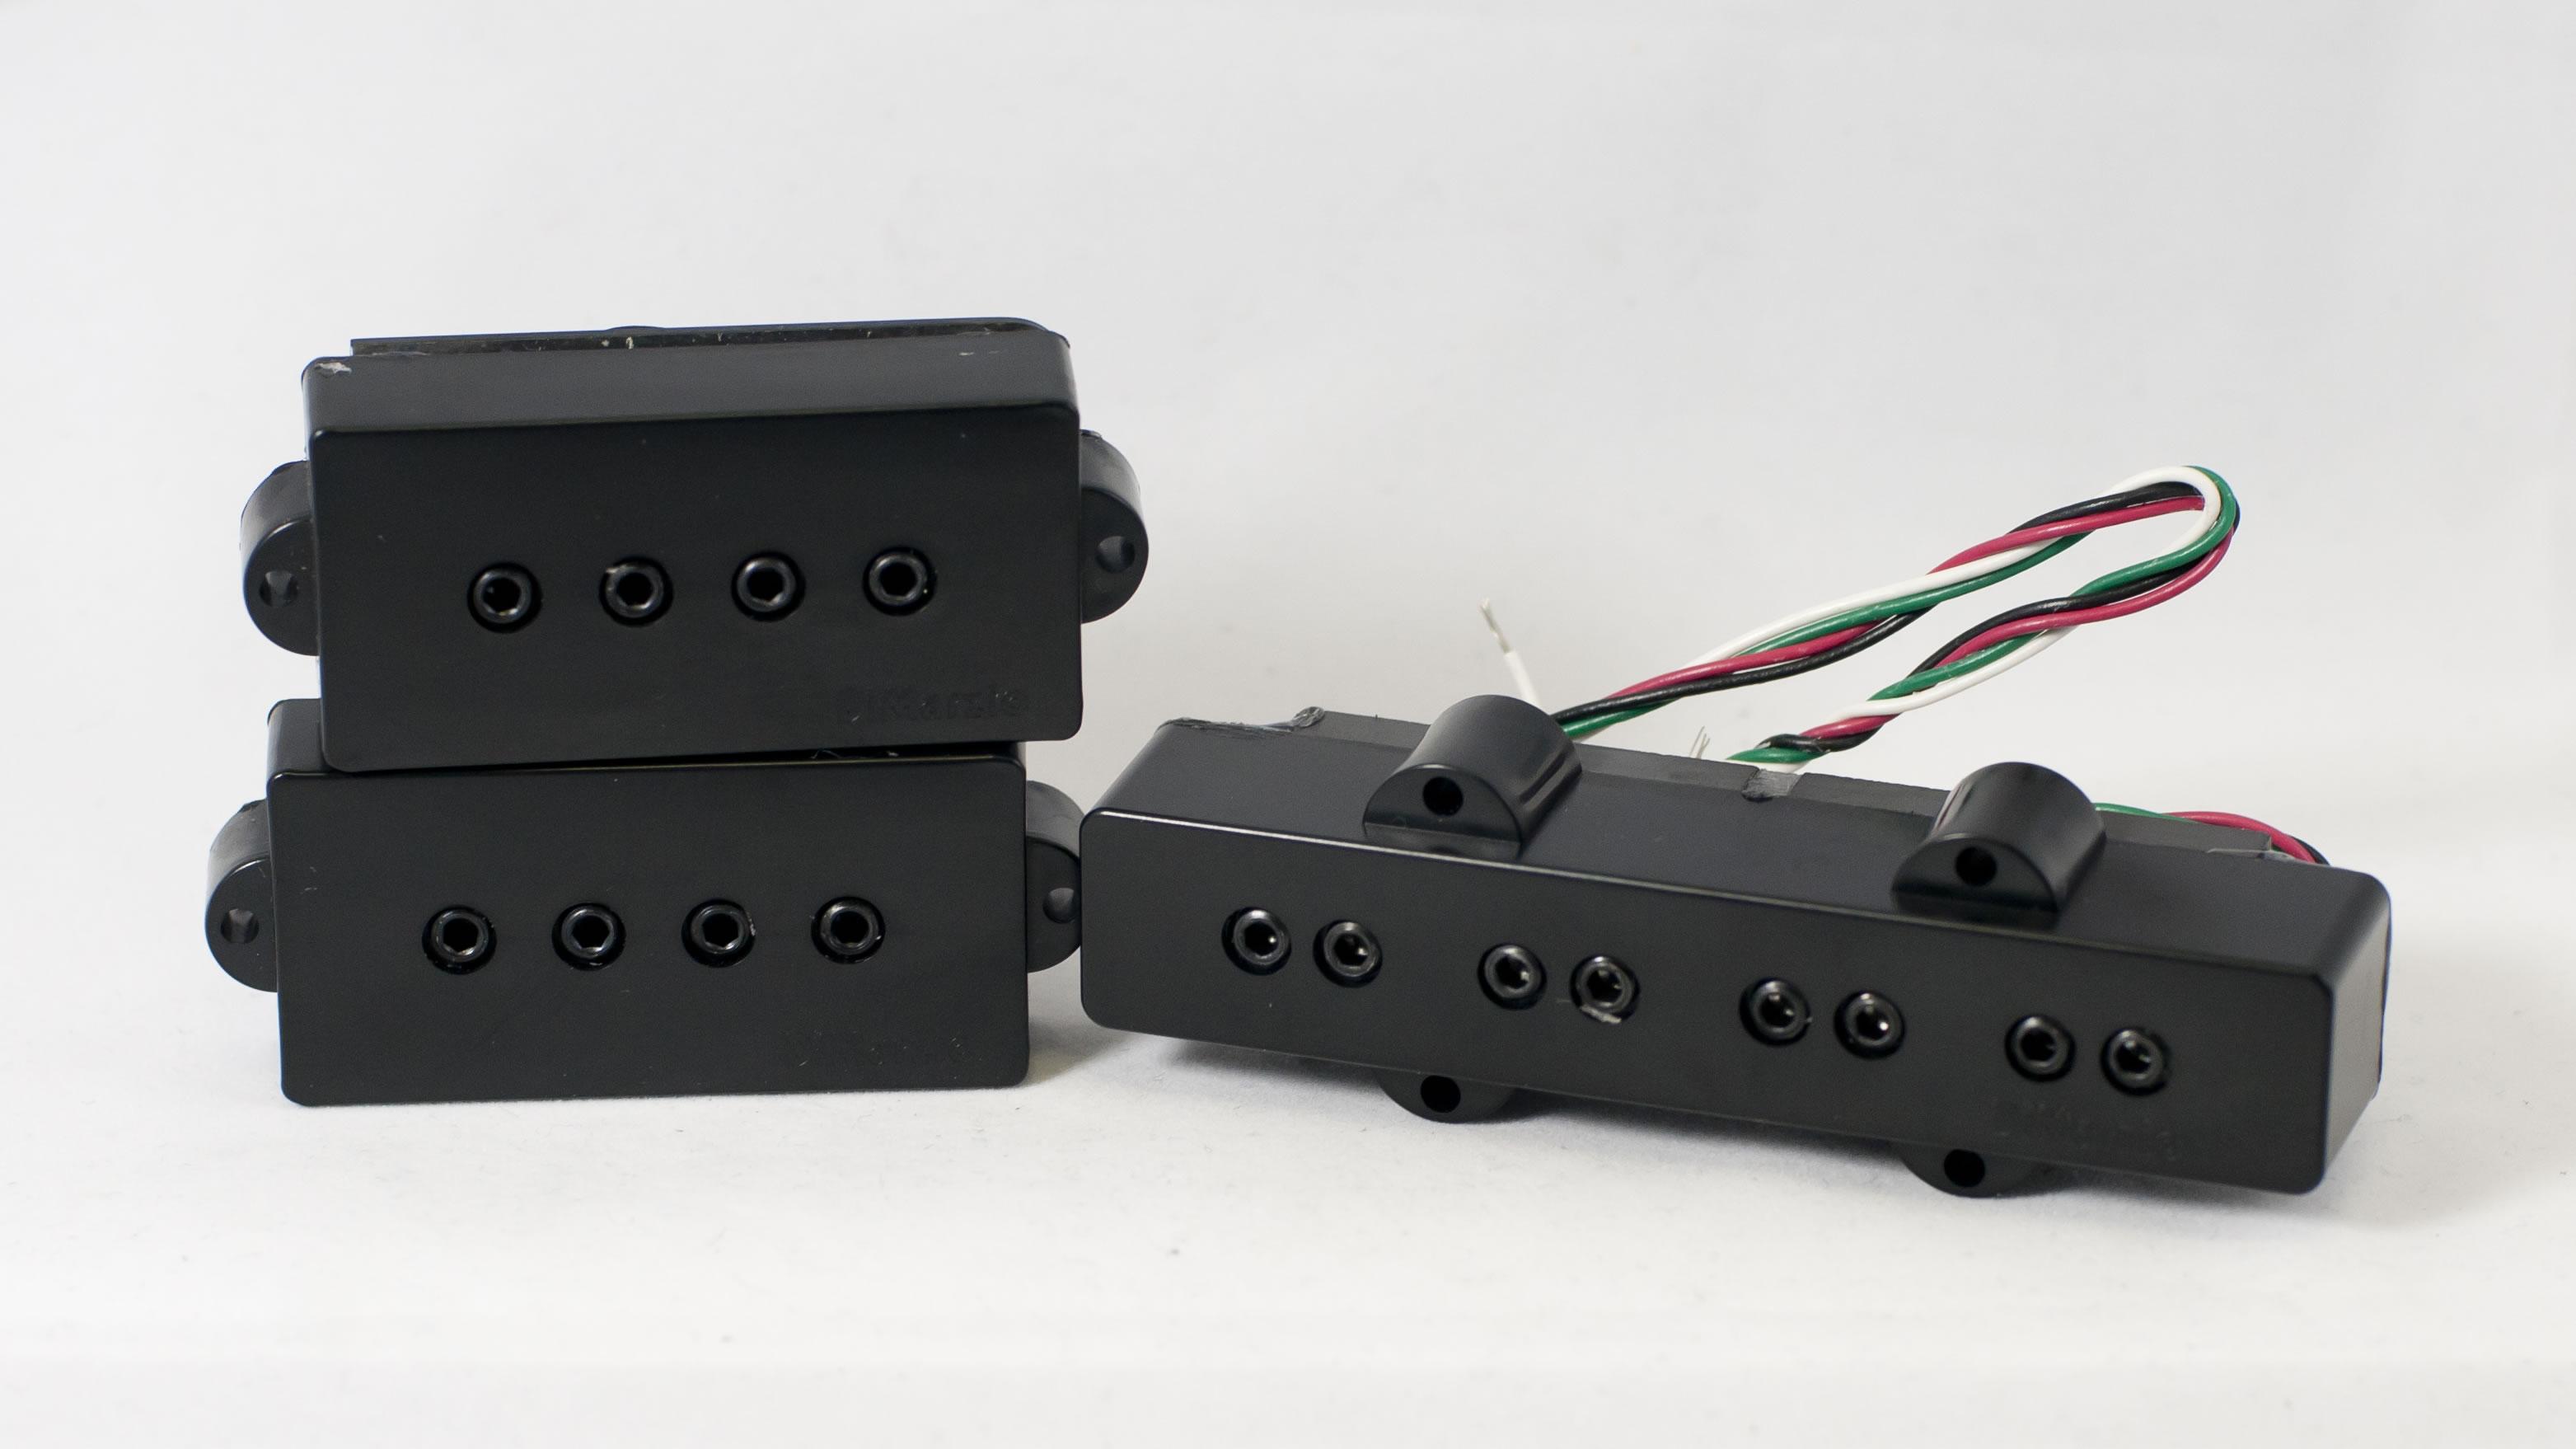 dimarzio dual sound wiring diagram 4685 dimarzio bass humbucker wiring diagram wiring resources  4685 dimarzio bass humbucker wiring